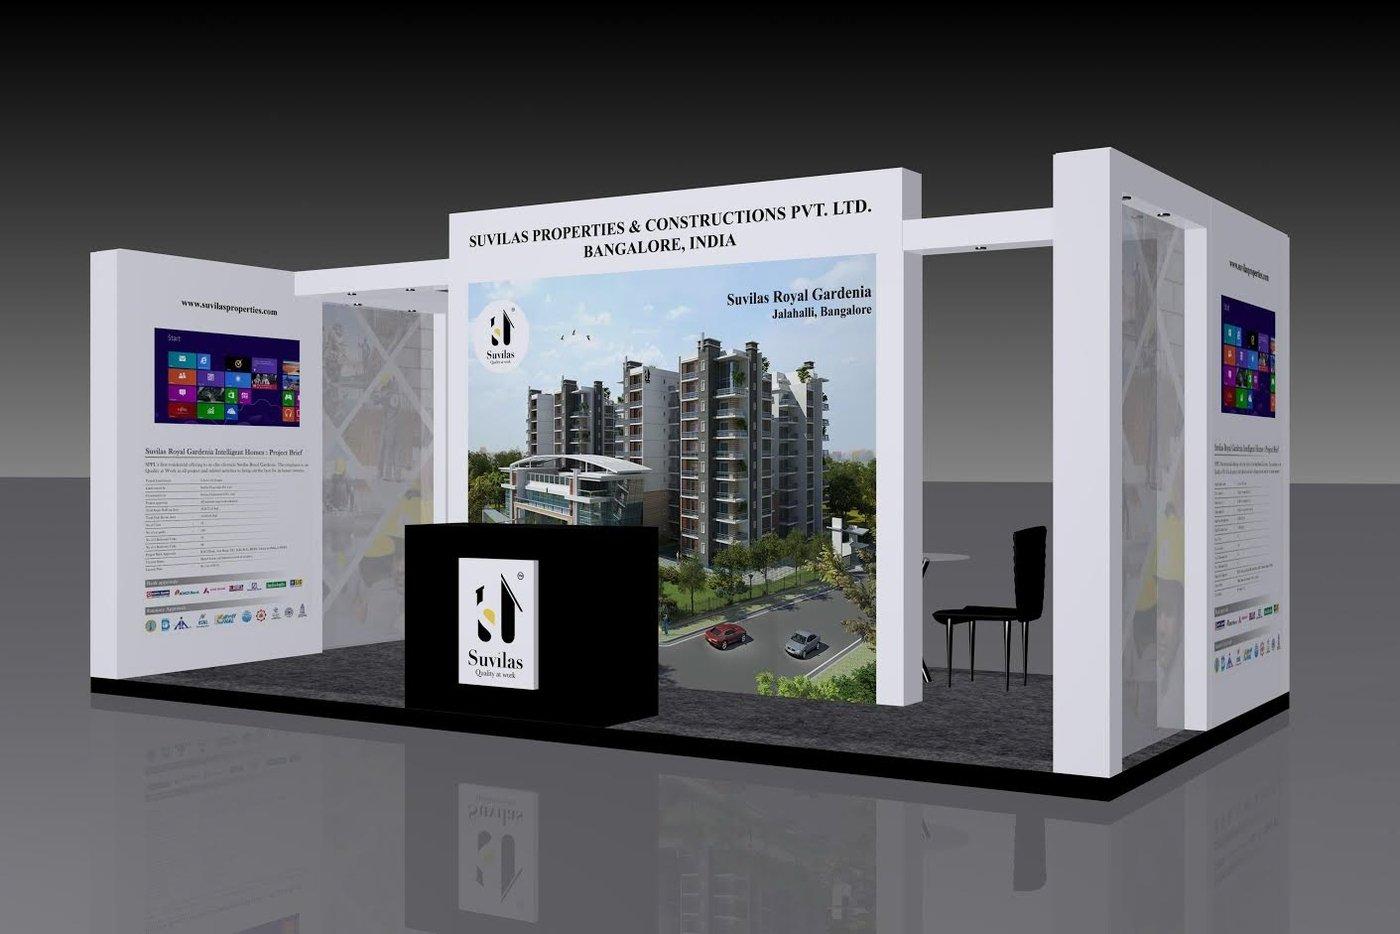 Exhibition Stall Designer Job In : Exhibition stall designs by prashanth ap at coroflot